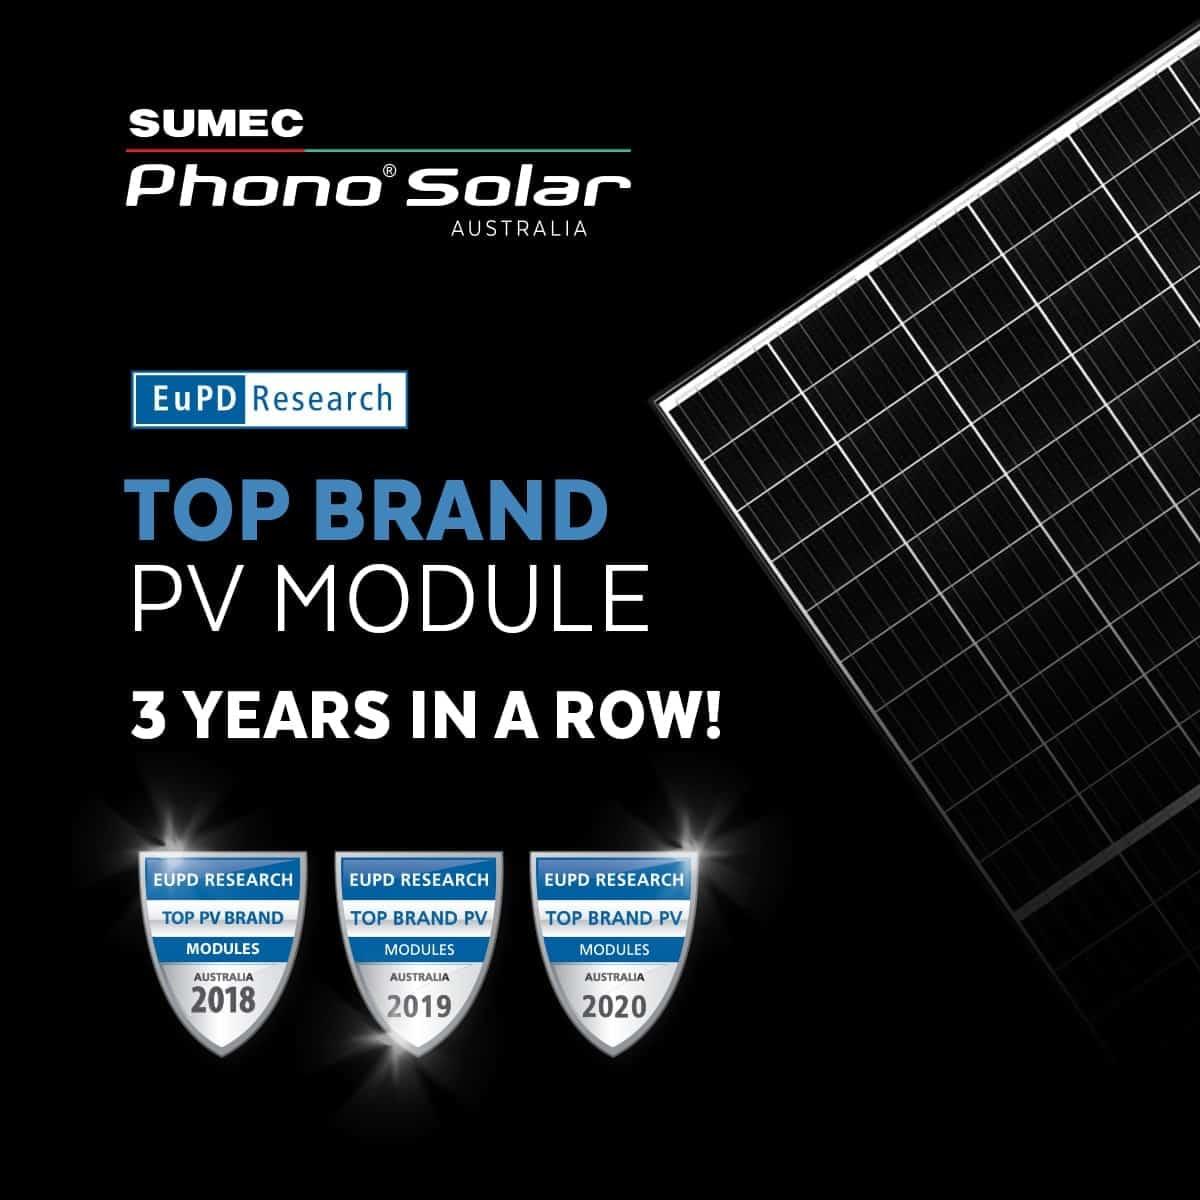 flyer Sumec Phono Solar